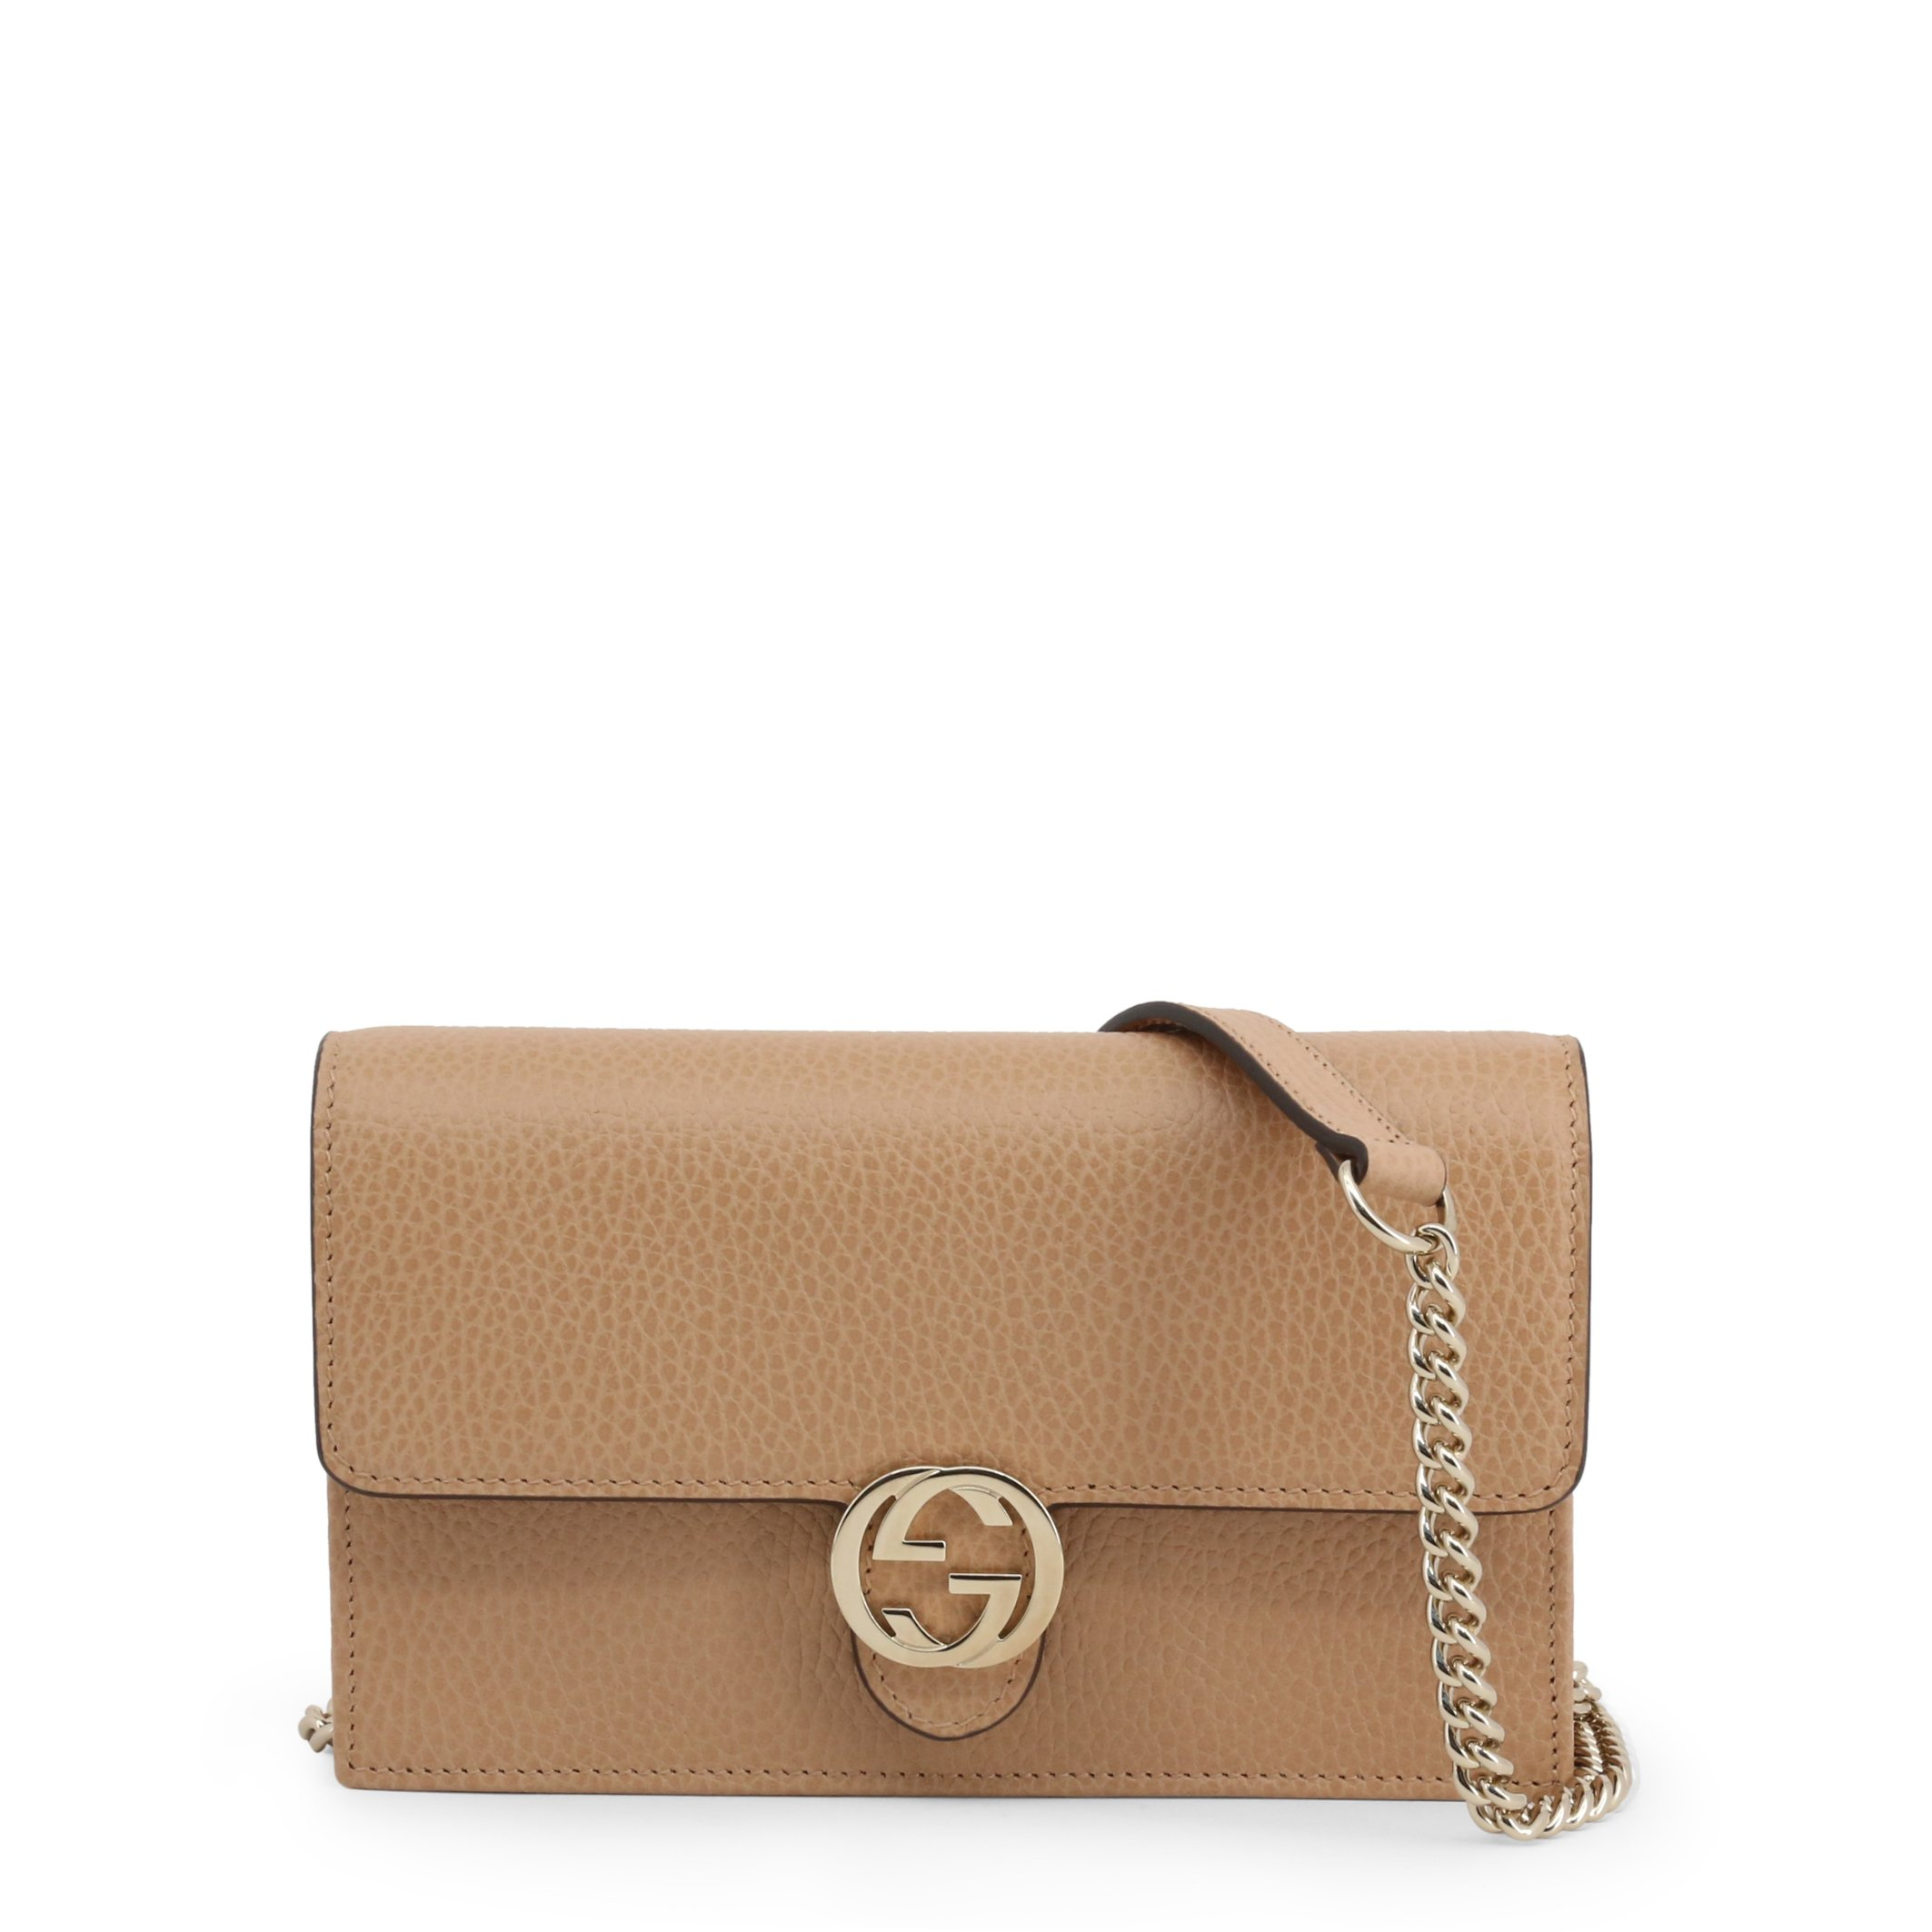 Gucci Women's Crossbody Bag Various Colours 510314_CA00G - brown NOSIZE